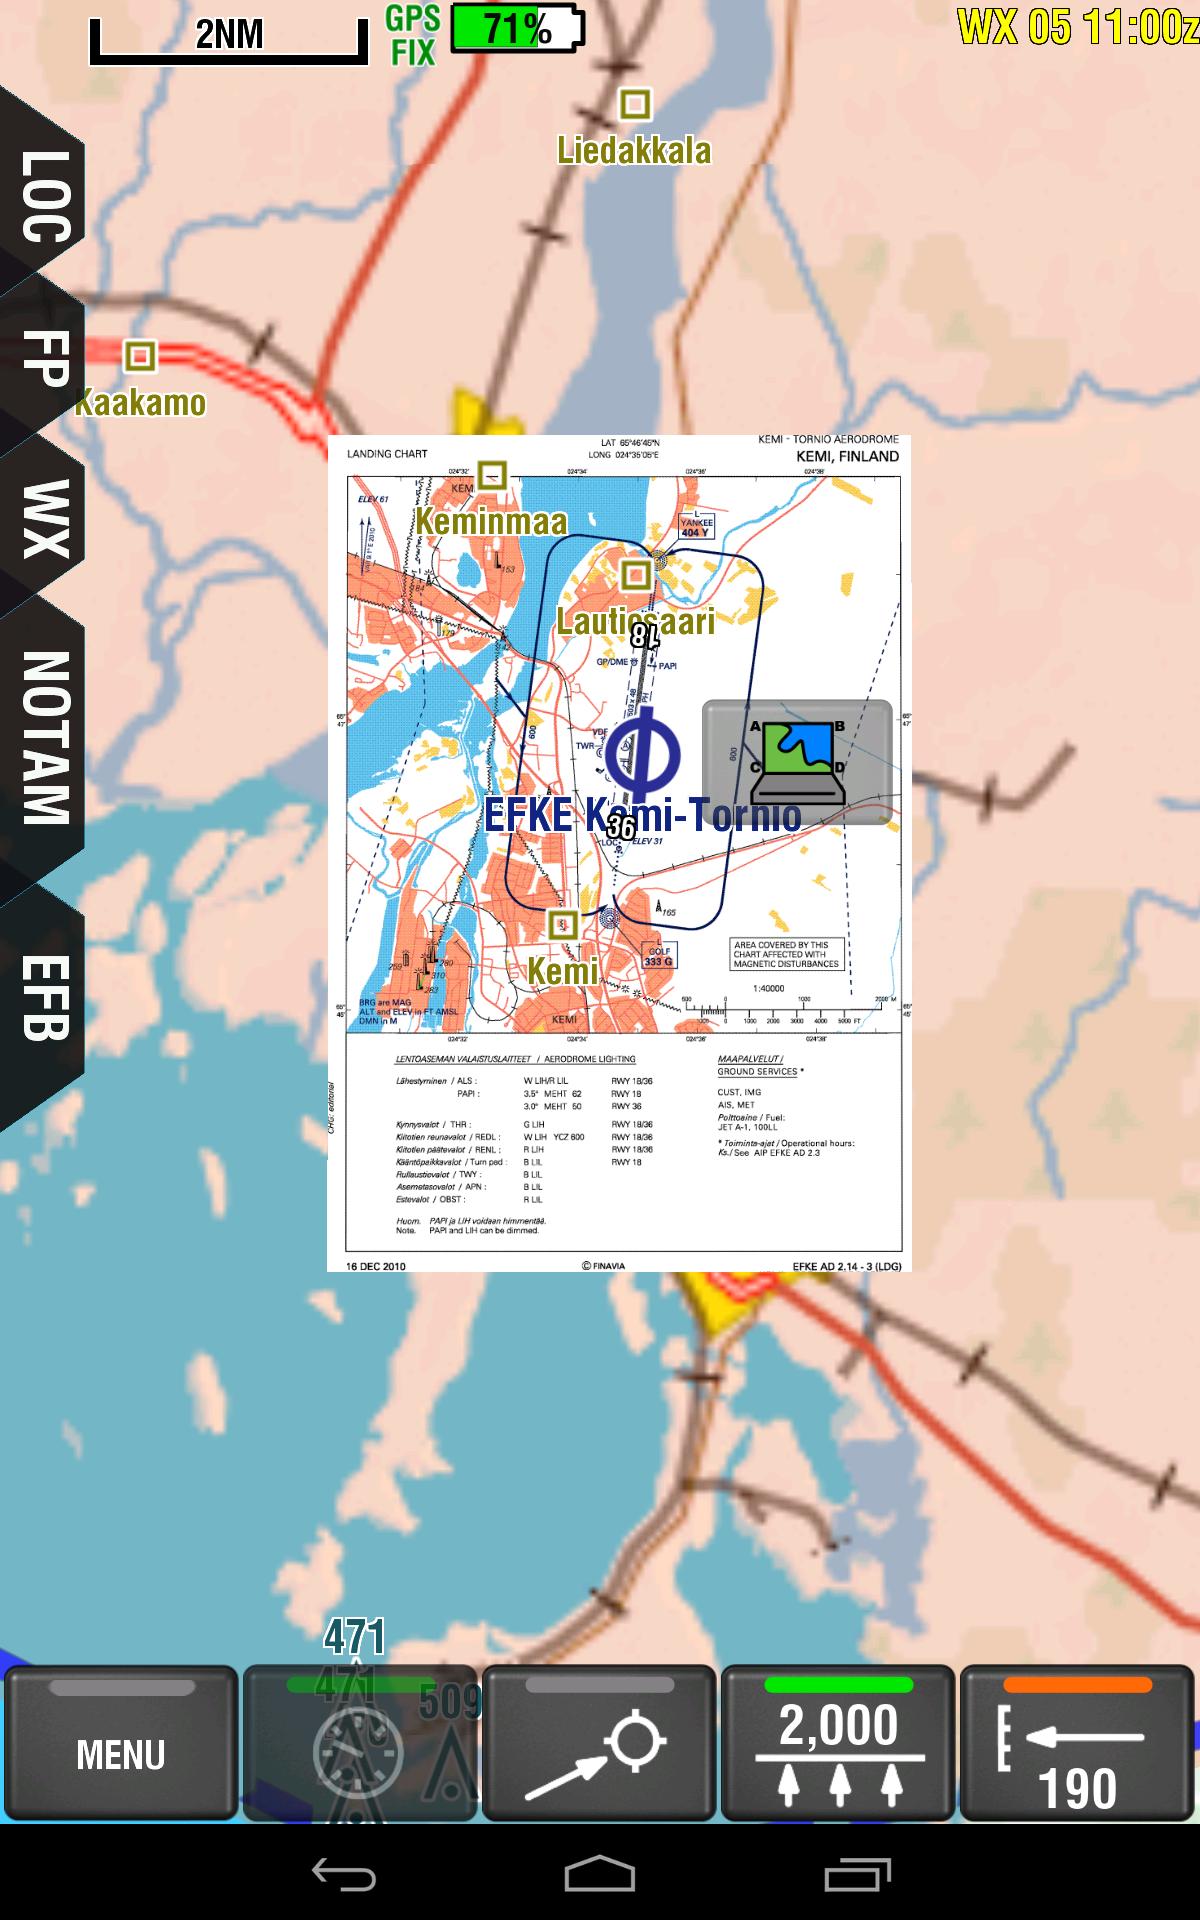 EFKE Landing chart